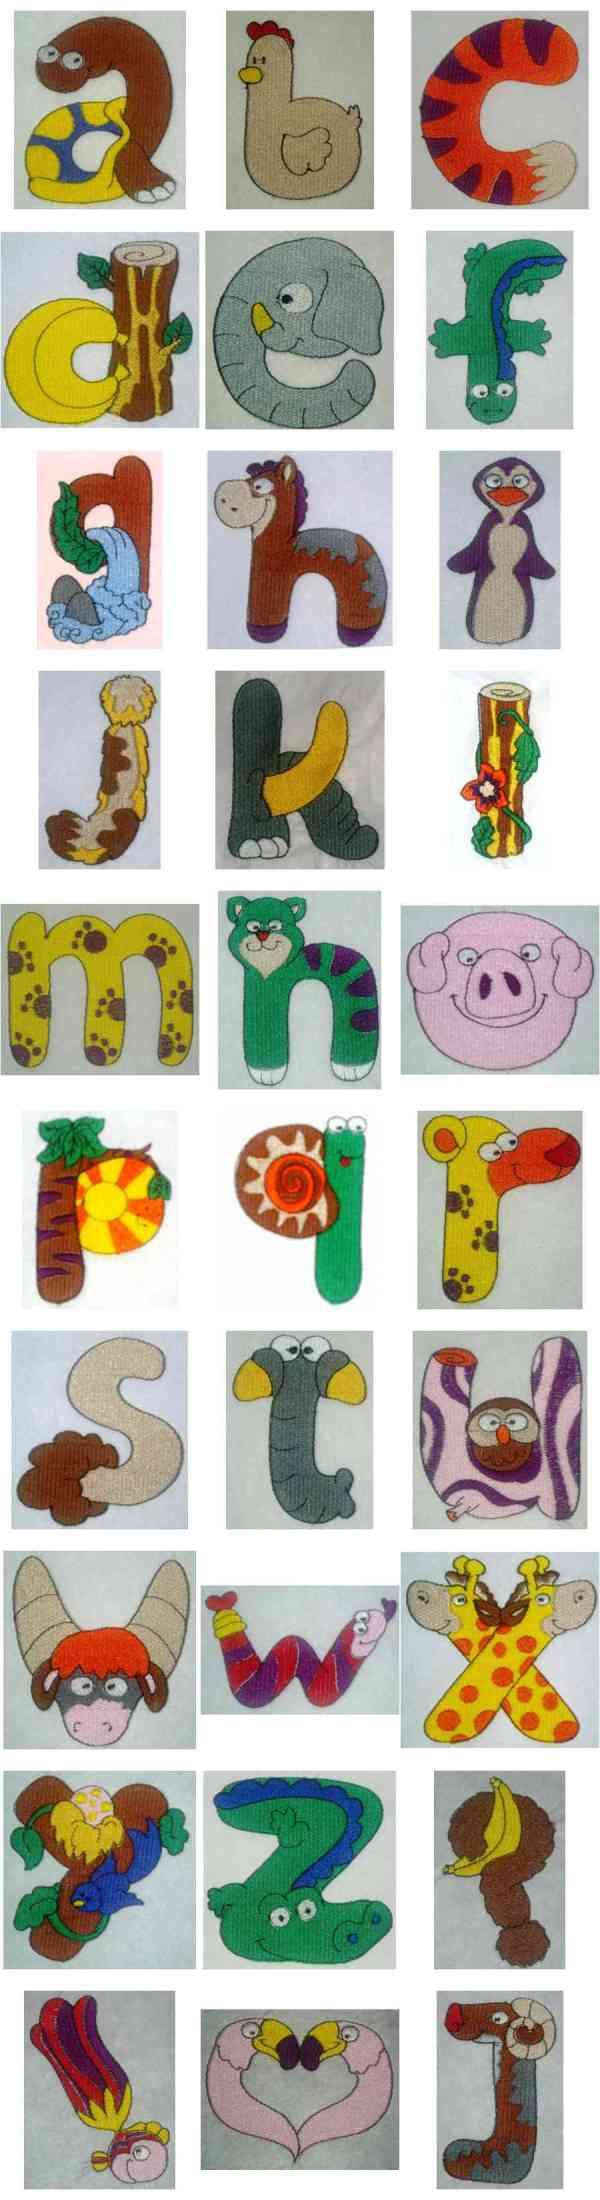 Machine embroidery designs lc animal alphabet set